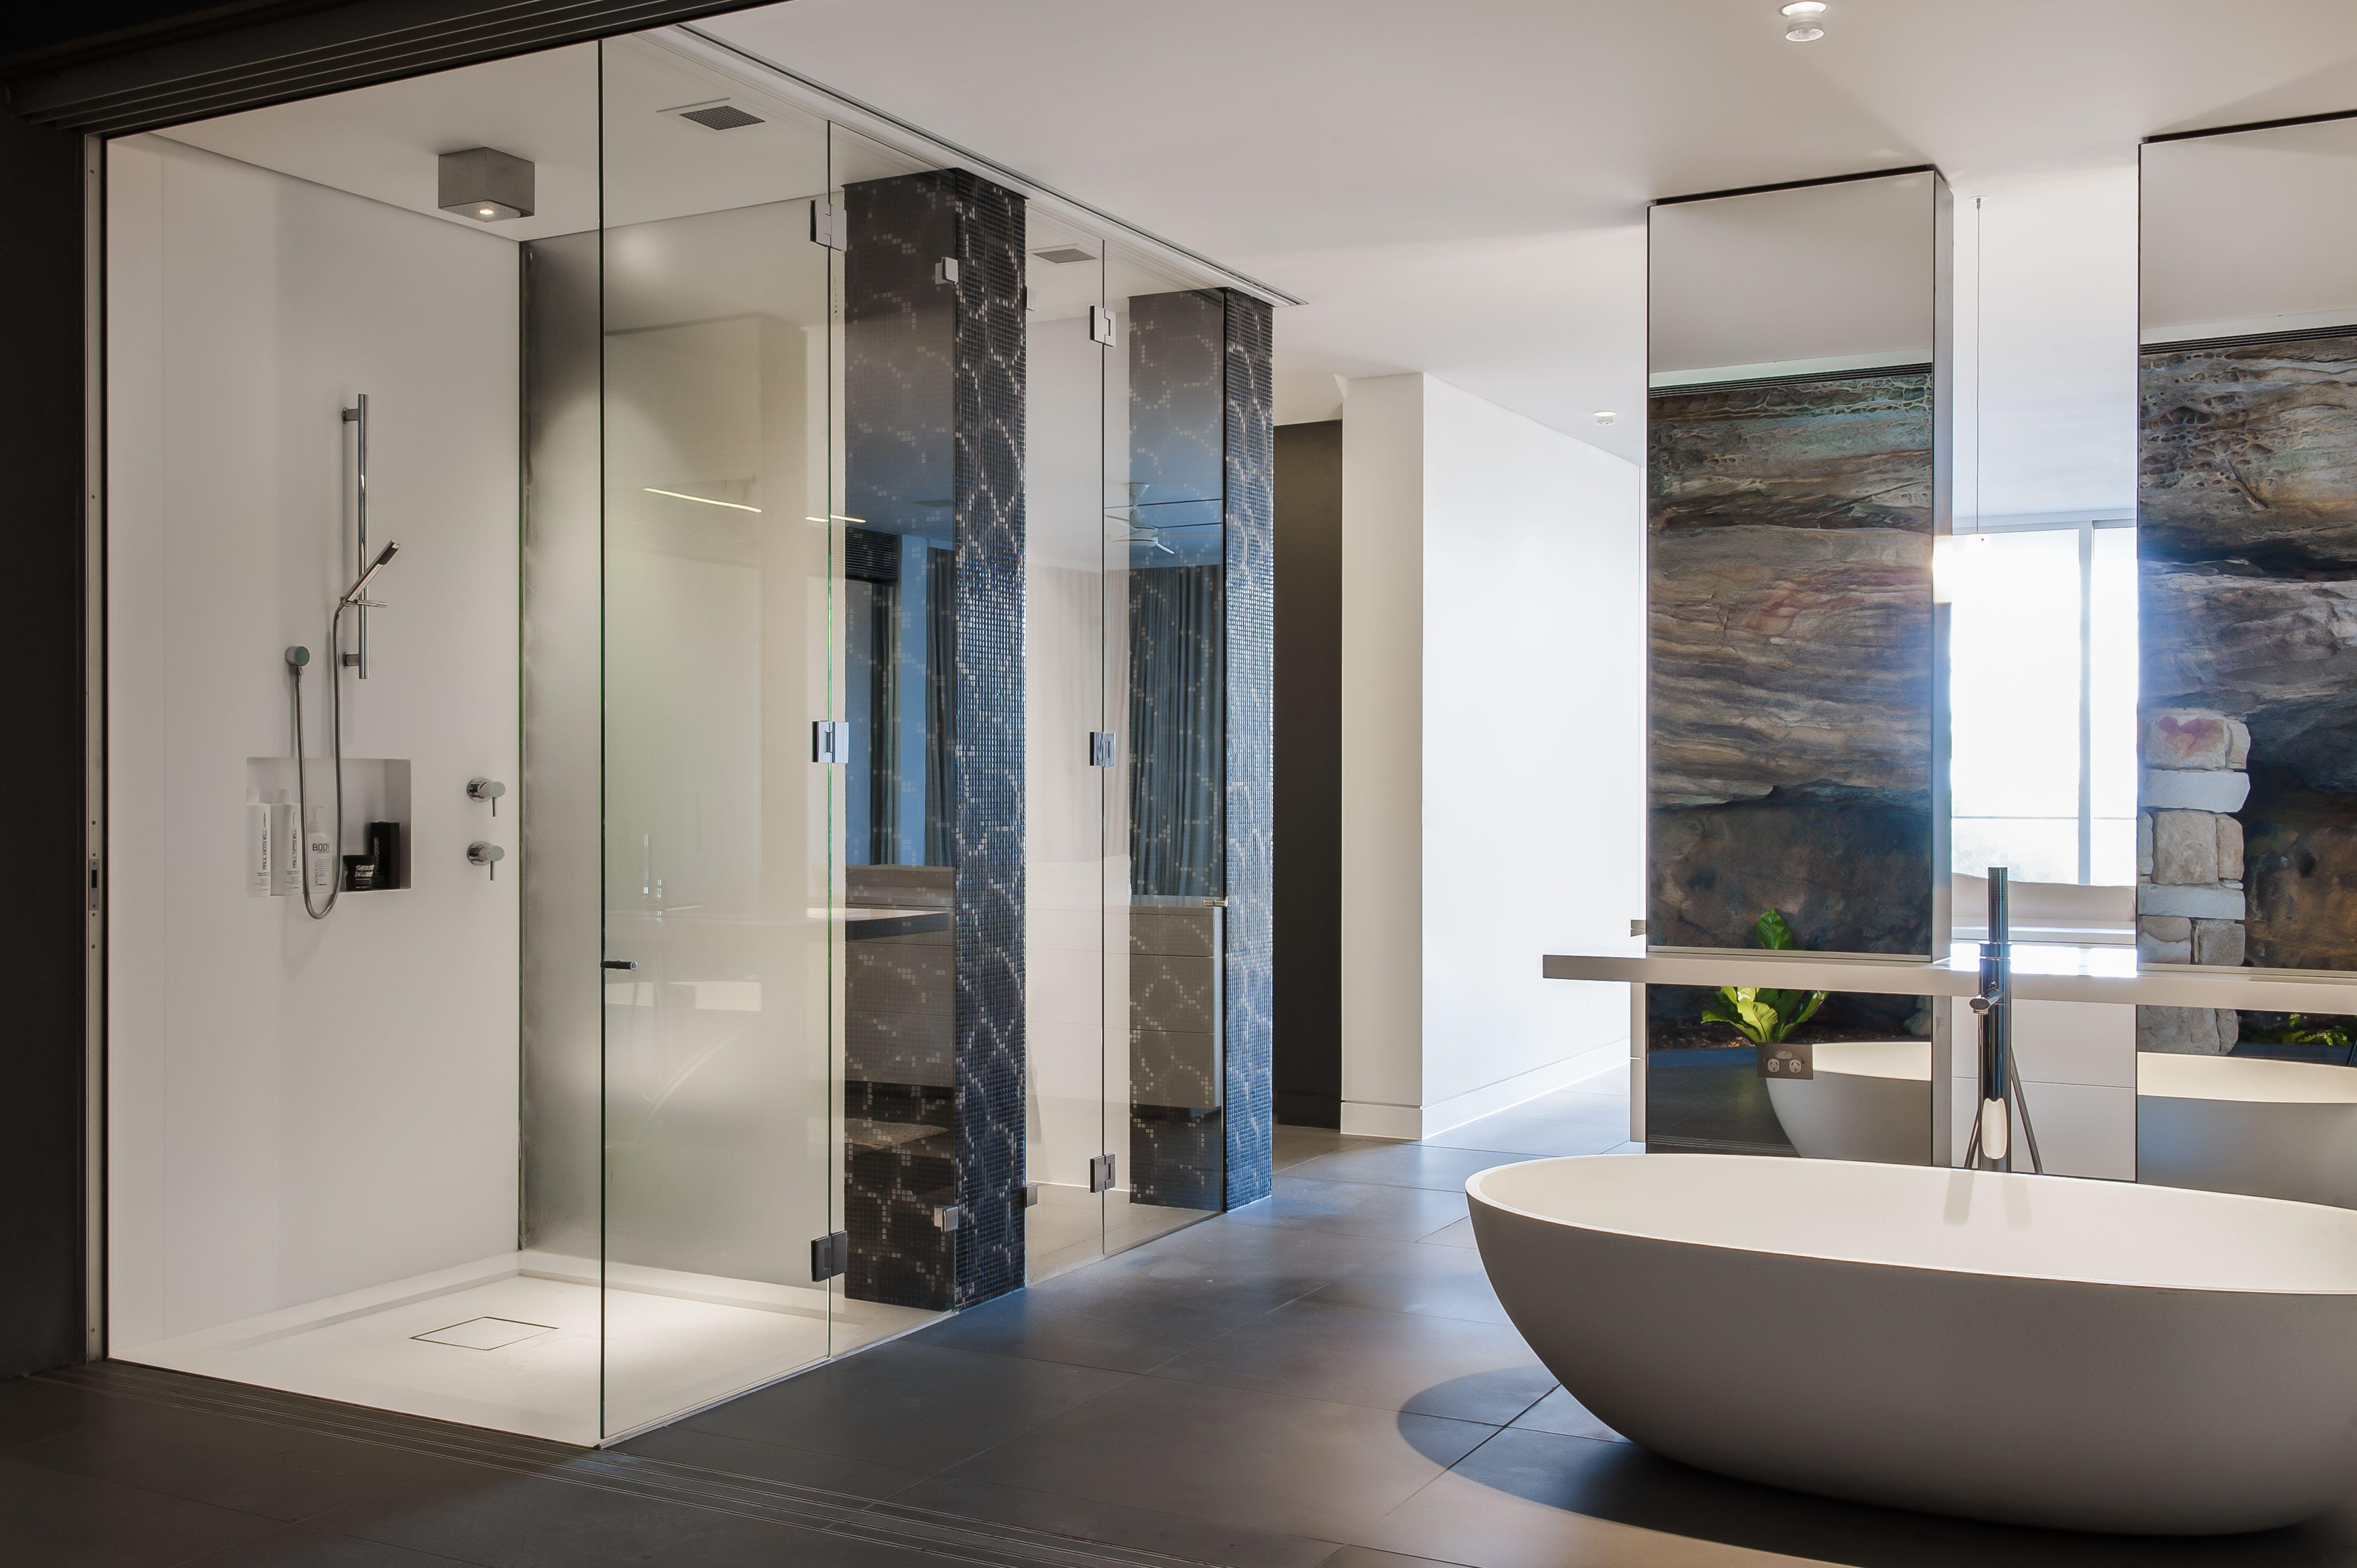 Best Kitchen Gallery: Bathroom Designs 2013 Bathroom Designs 2013 R Weup Co of Bathroom Design 2013  on rachelxblog.com